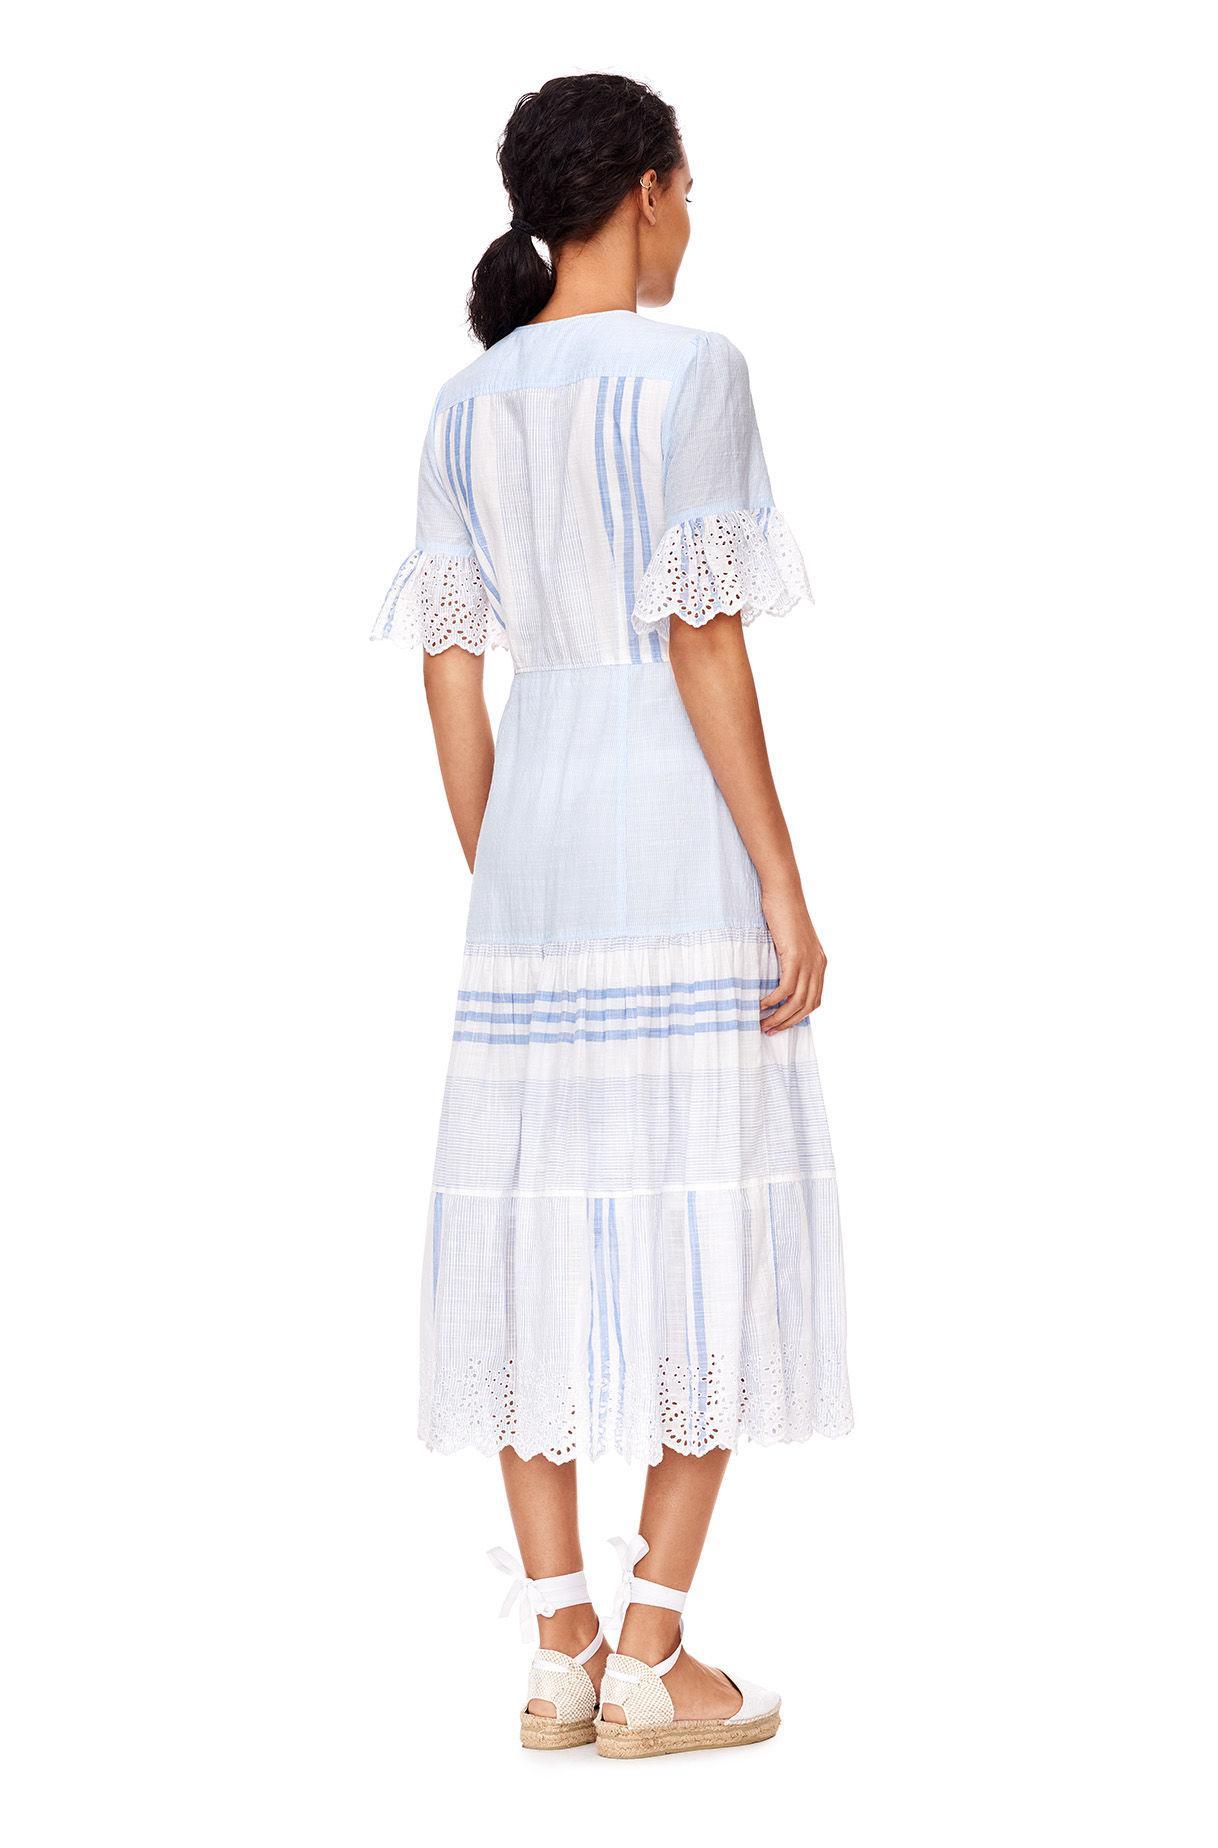 76517377a2 Rebecca Taylor La Vie Variegated Stripe Dress in Blue - Lyst